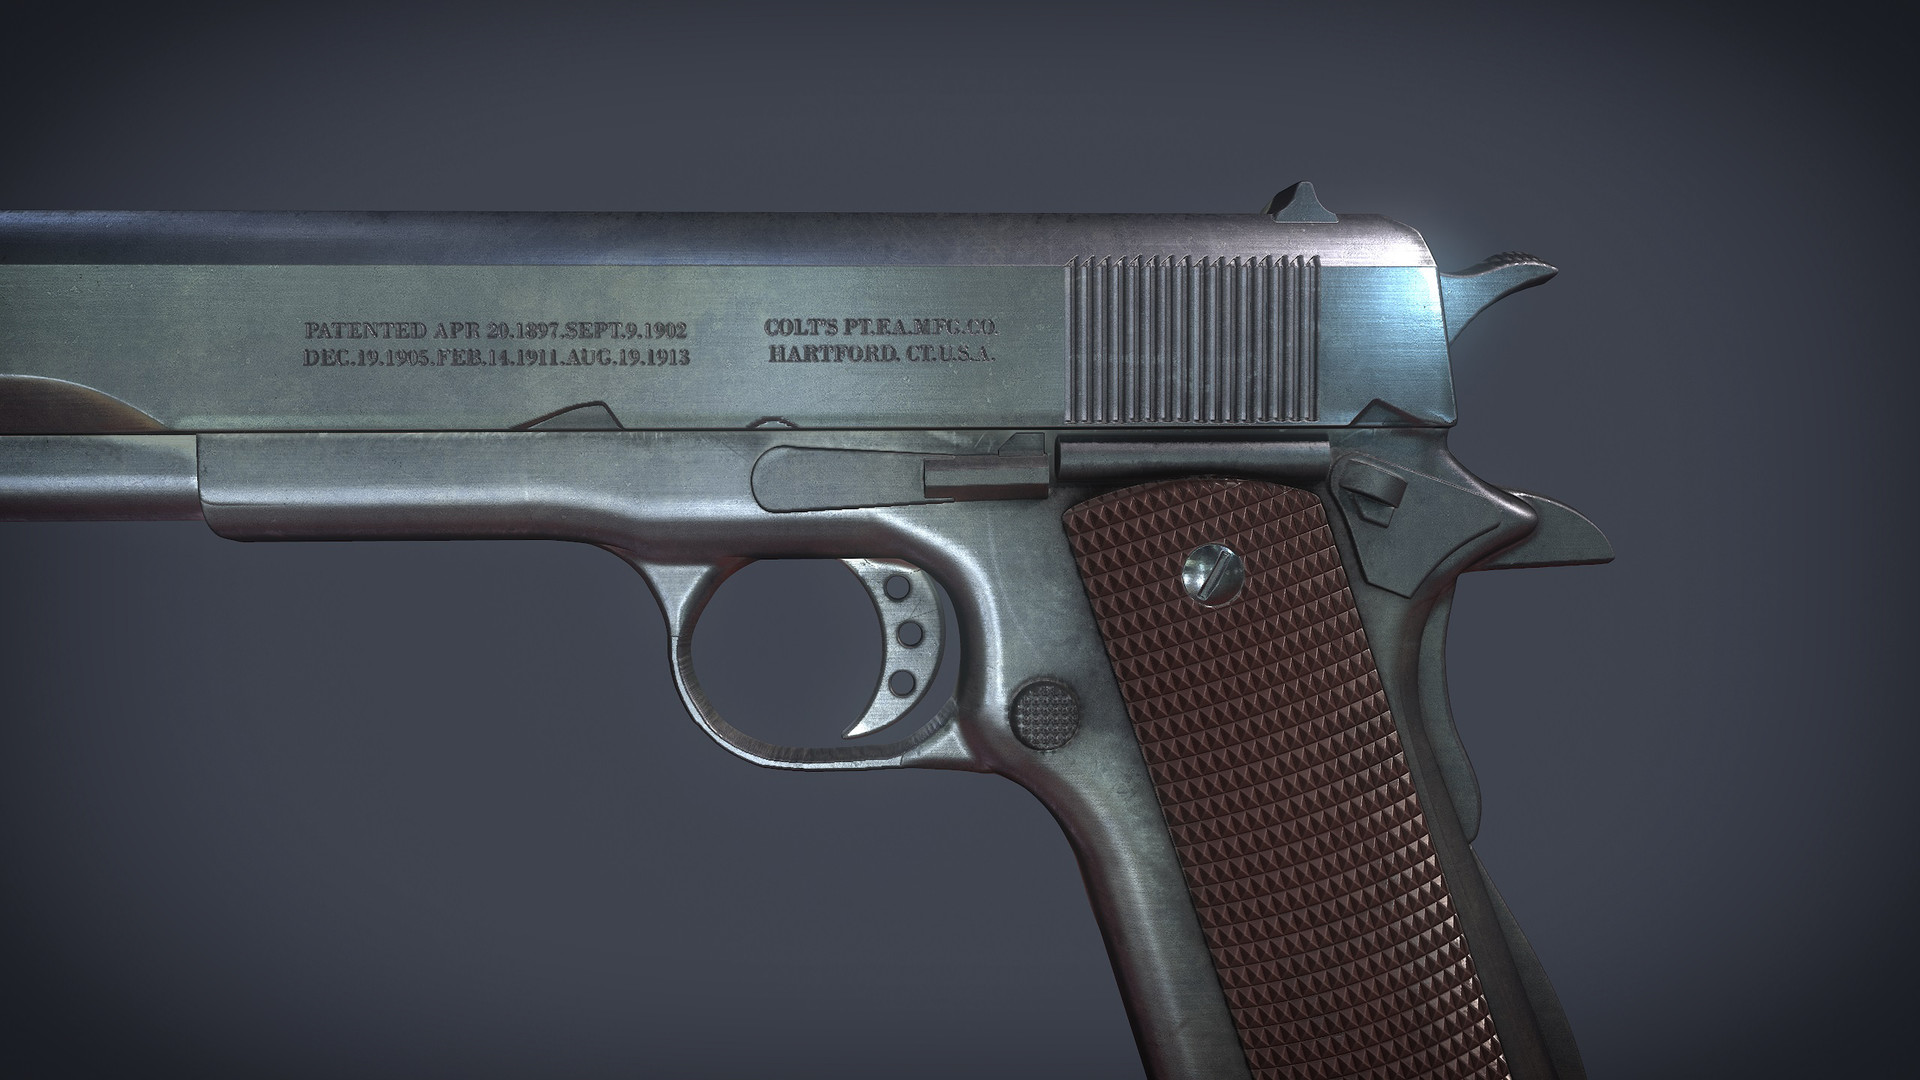 ArtStation - M1911 Handgun - 100% Substance designer (literally